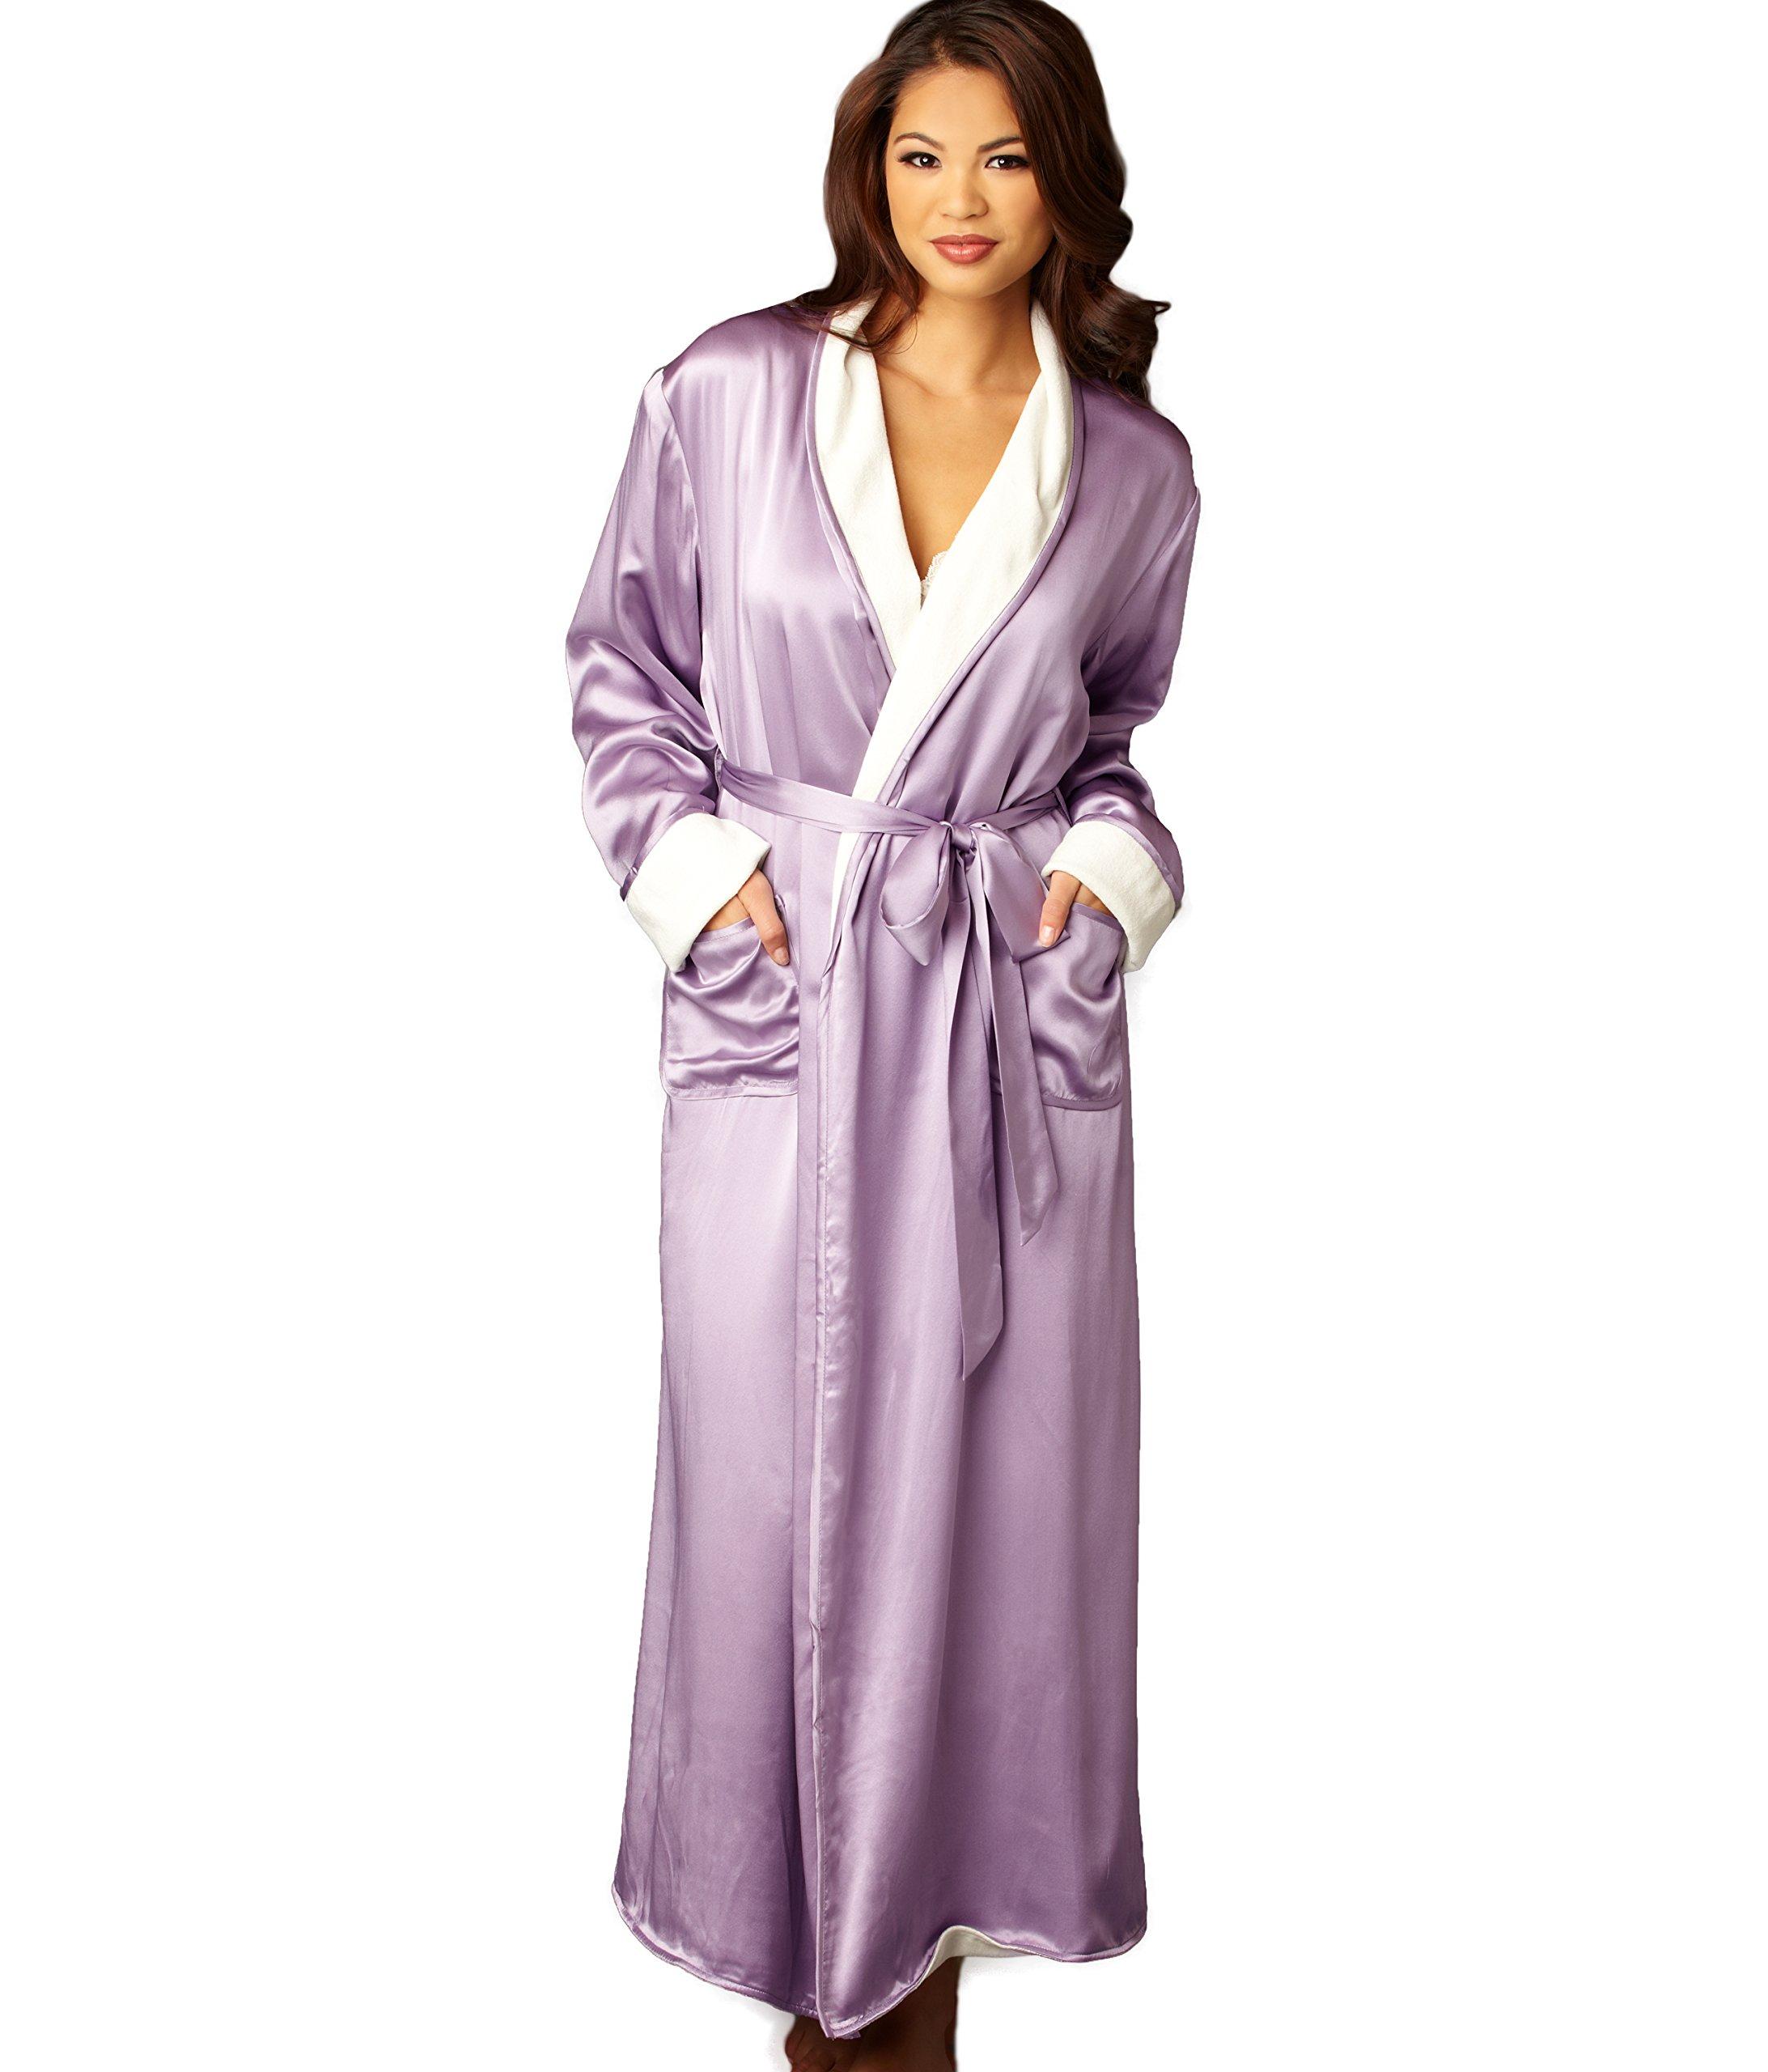 Julianna Rae Women's 100% Silk, Il Cieli Spa Robe, Amethyst, XS